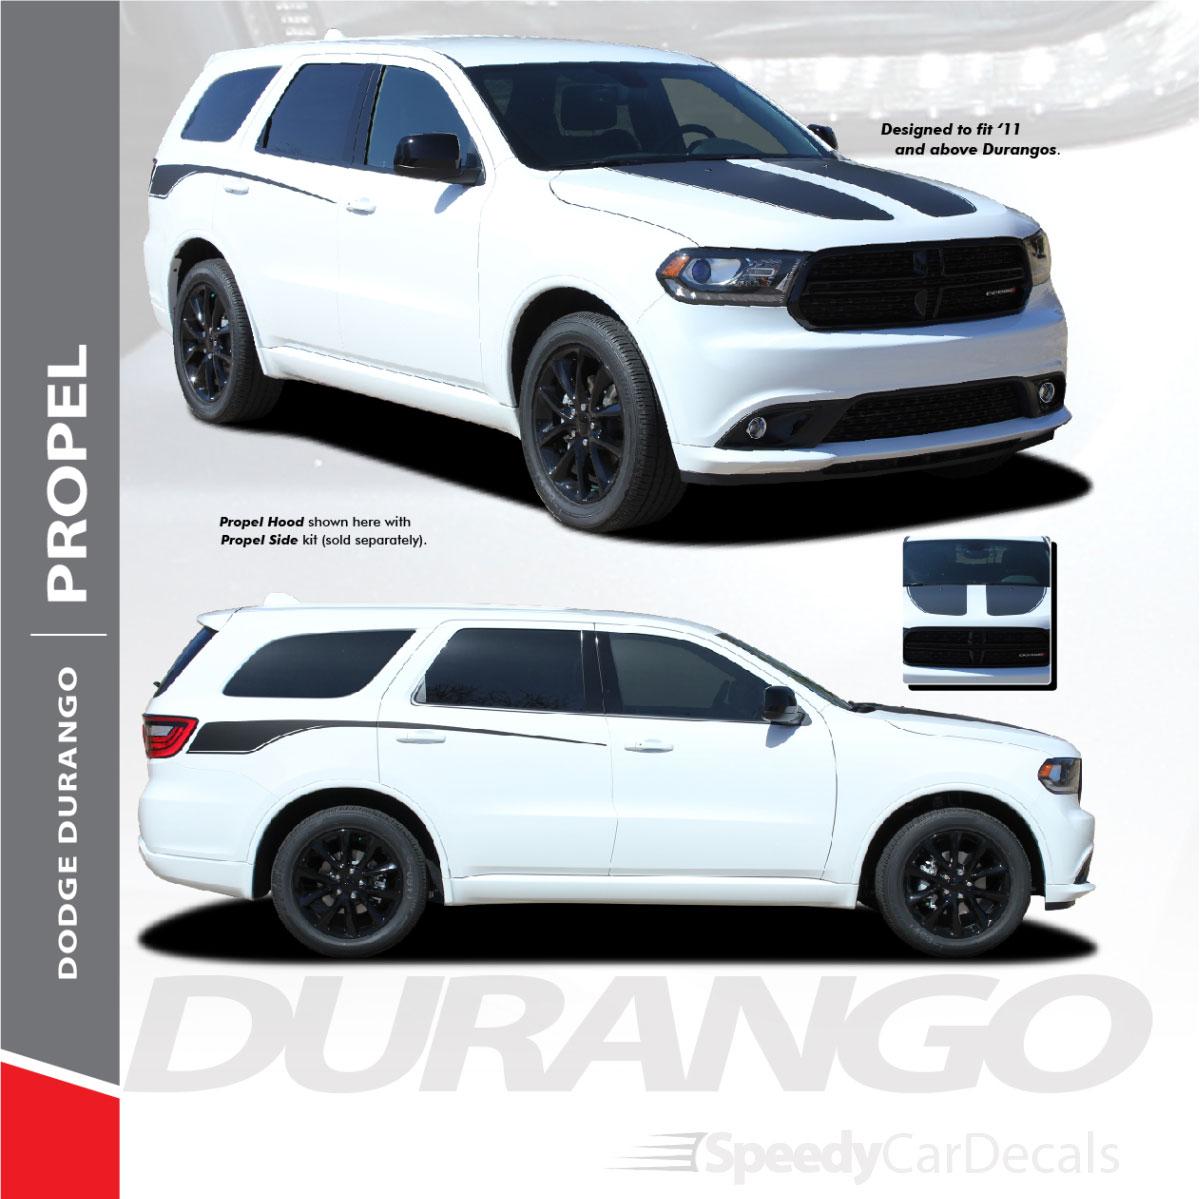 2011 2021 Dodge Durango Hood Stripe Matte Black Propel Hood Premium And Supreme Install Speedycardecals Fast Car Decals Auto Decals Auto Stripes Vehicle Specific Graphics